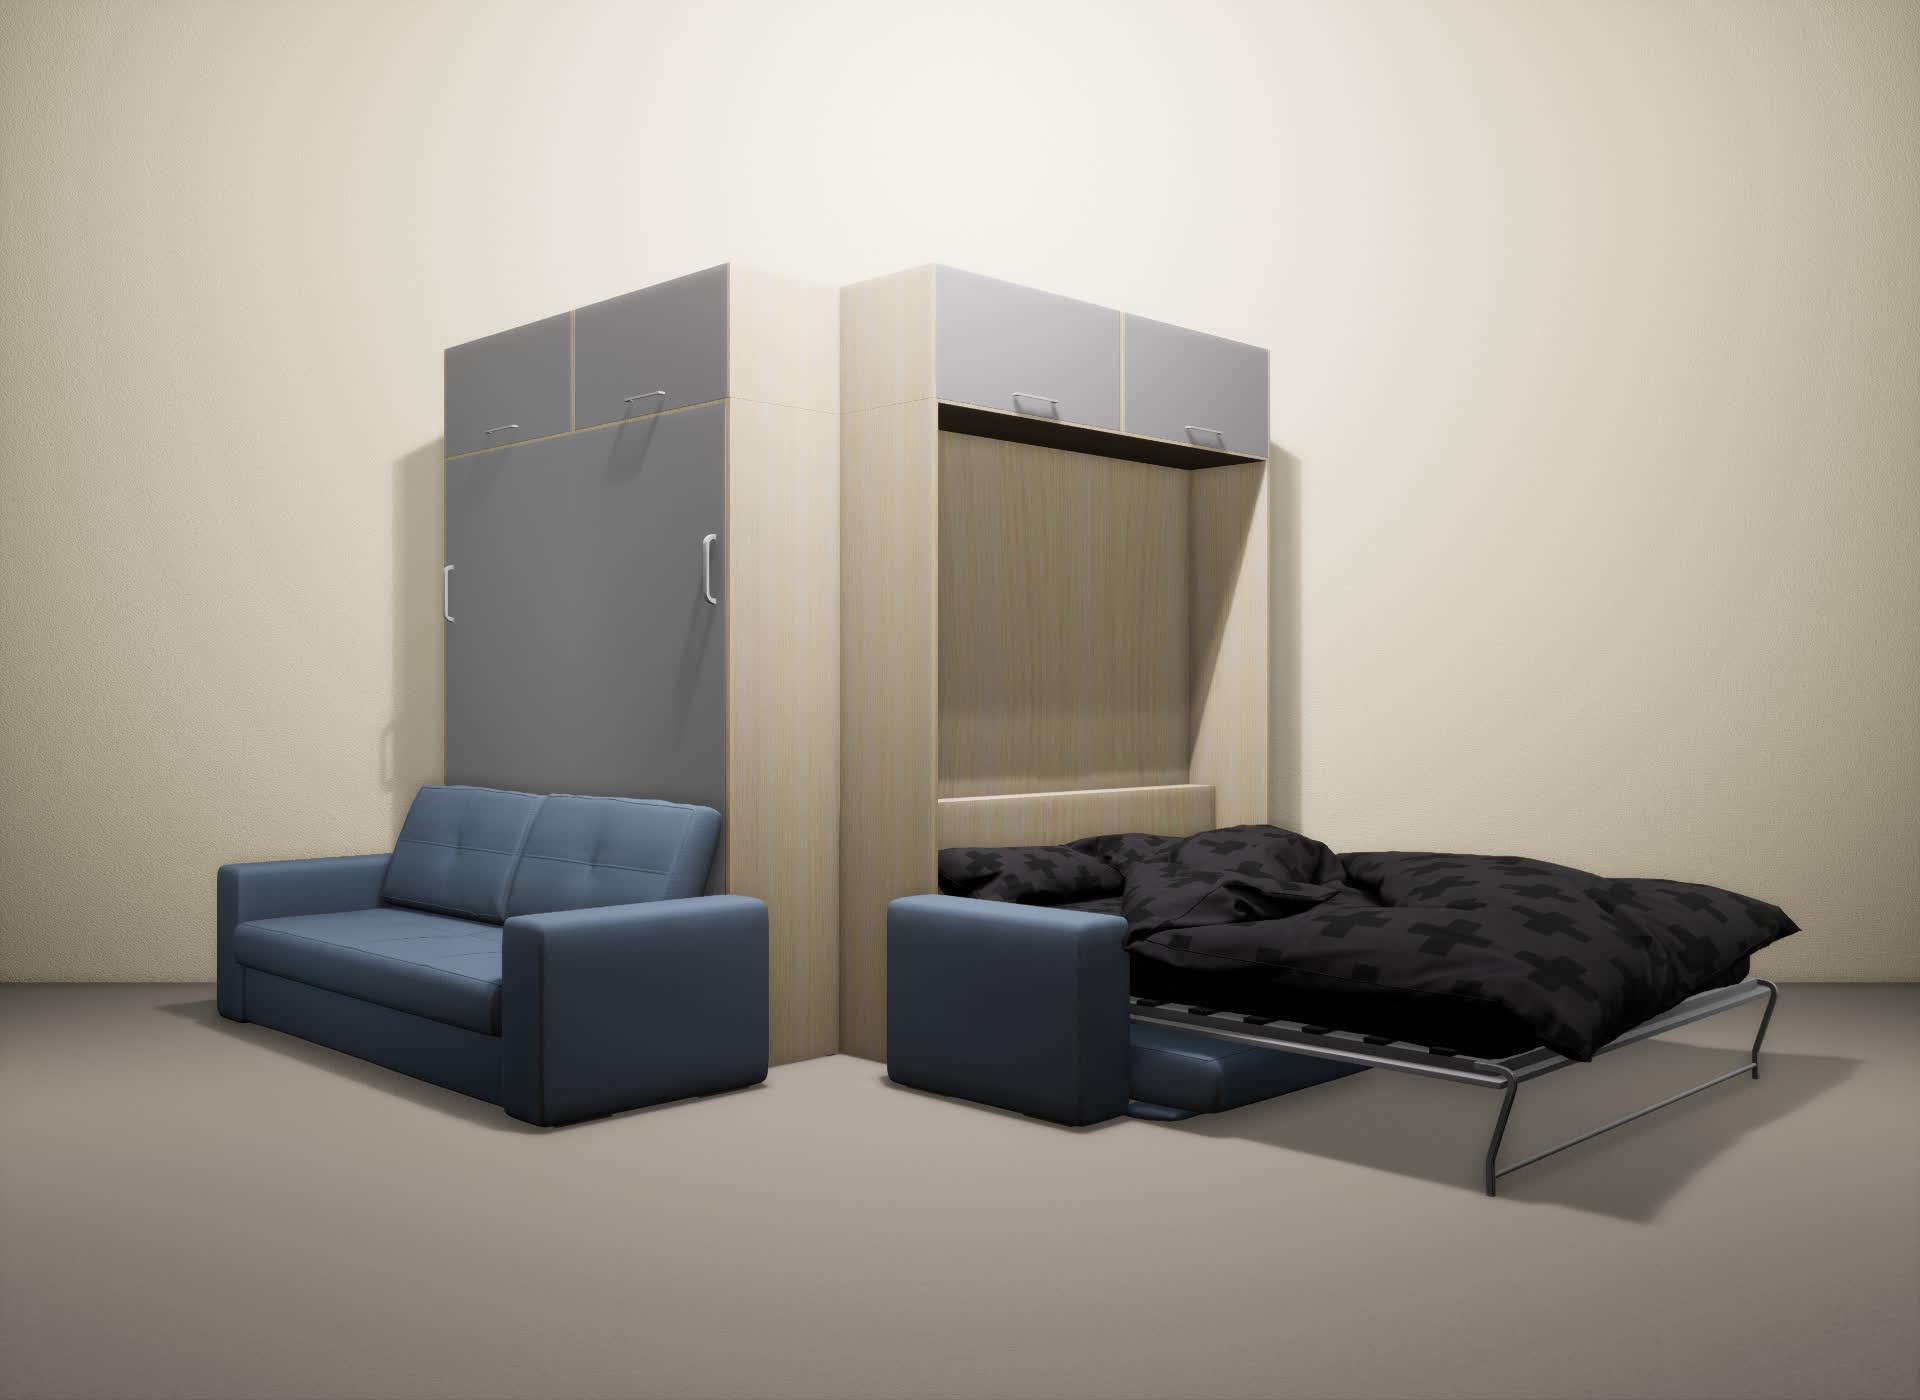 Шкаф-кровать SMART HOME Гамма молочный дуб/серый